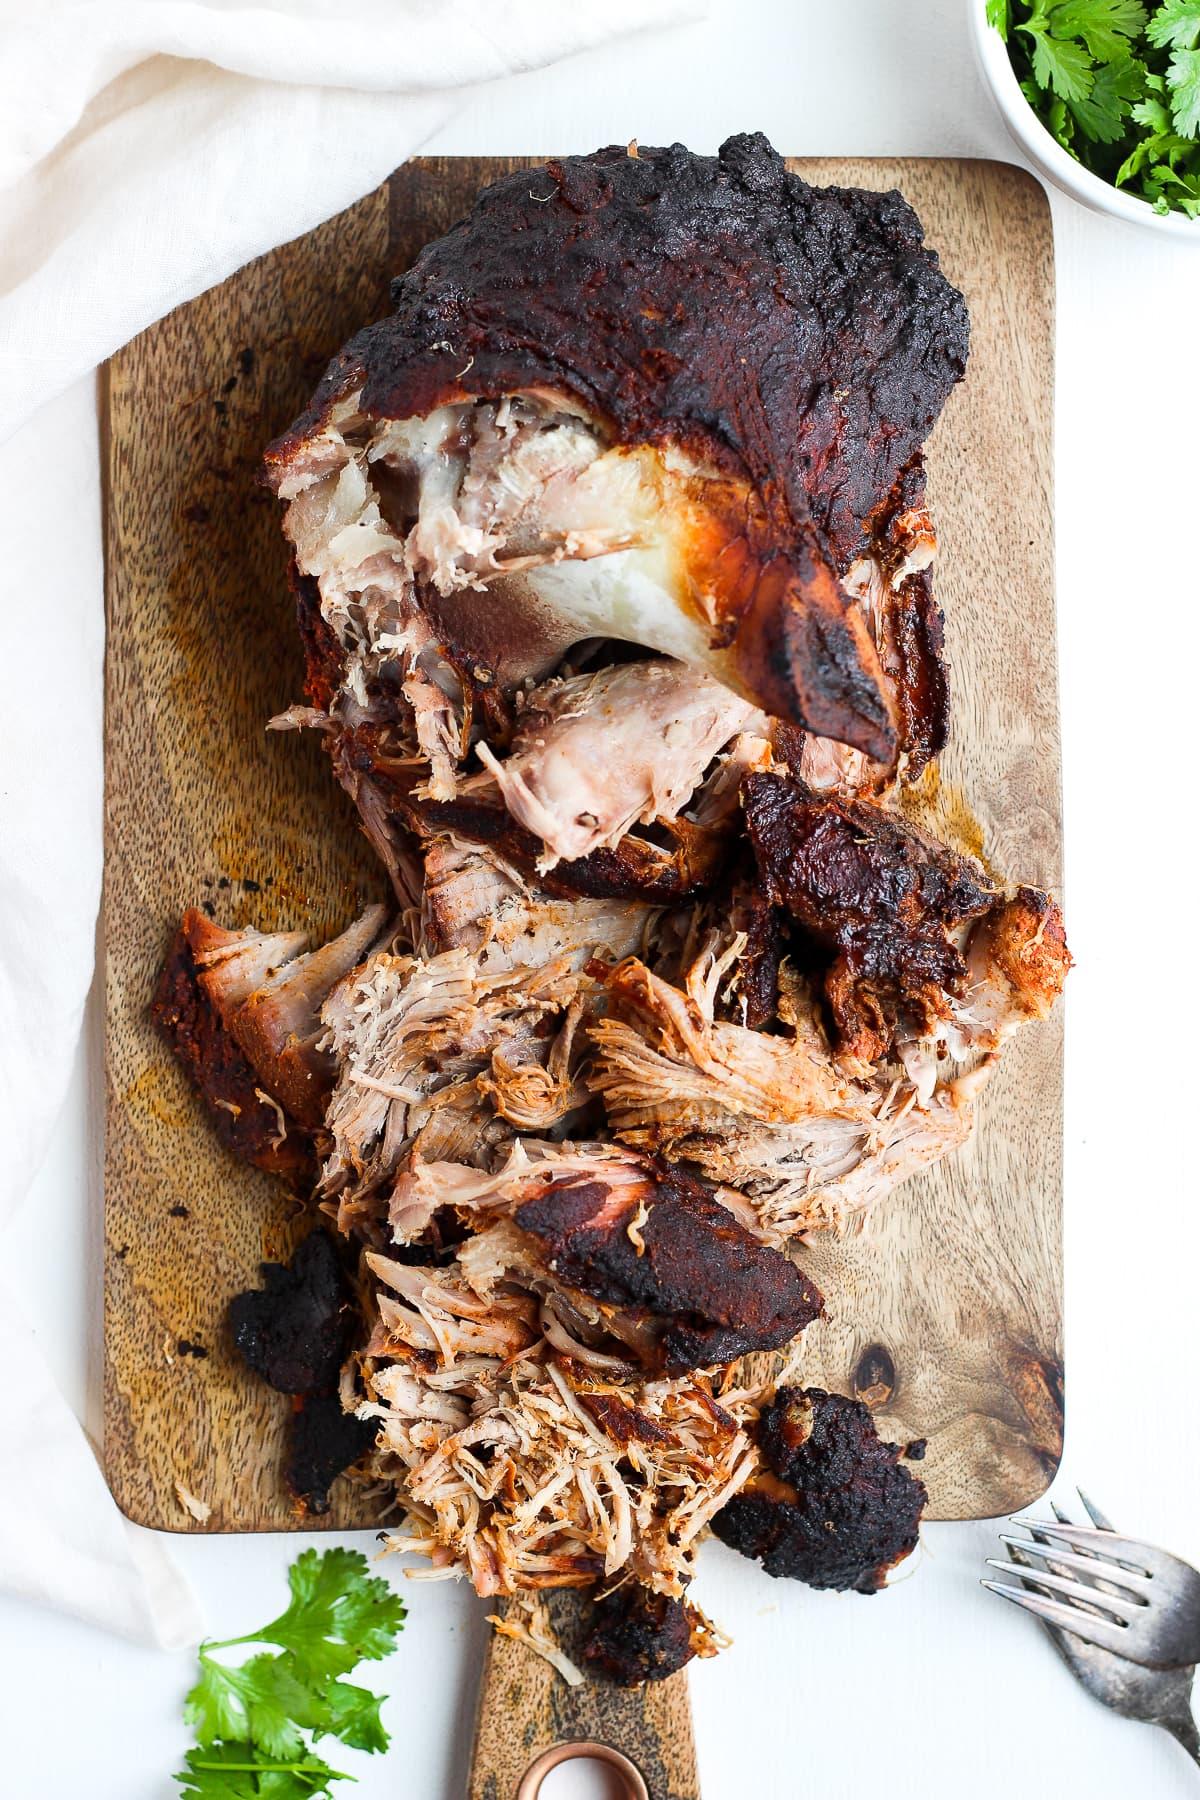 Smoked Pork Shoulder - your go-to smoked pork shoulder tutorial in an electric smoker! #smokedporkshoulder